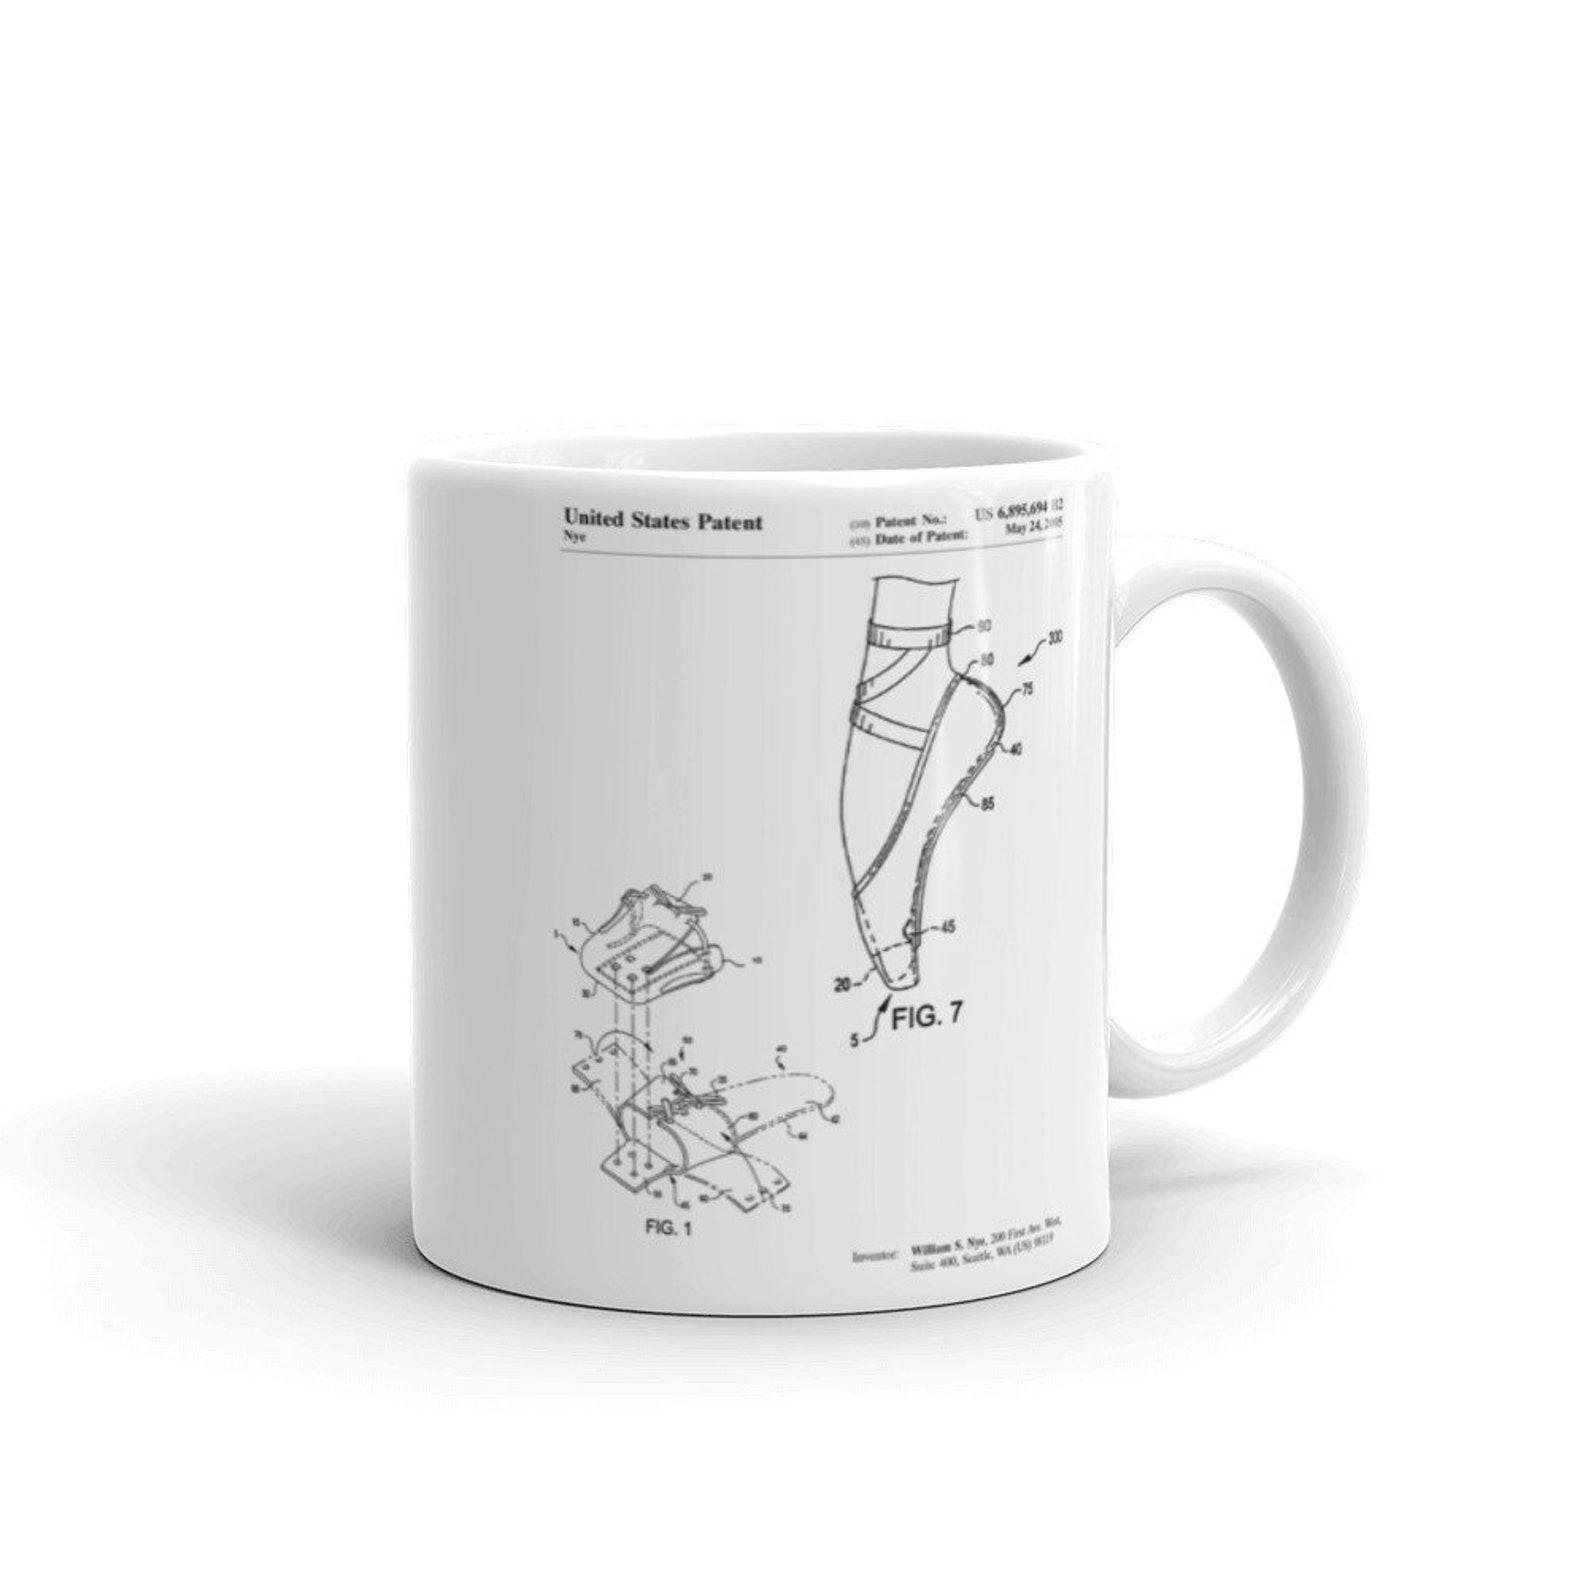 ballet shoe patent mug, ballet slippers, dance studio, ballerina gift, ballerina mug, unique gift idea